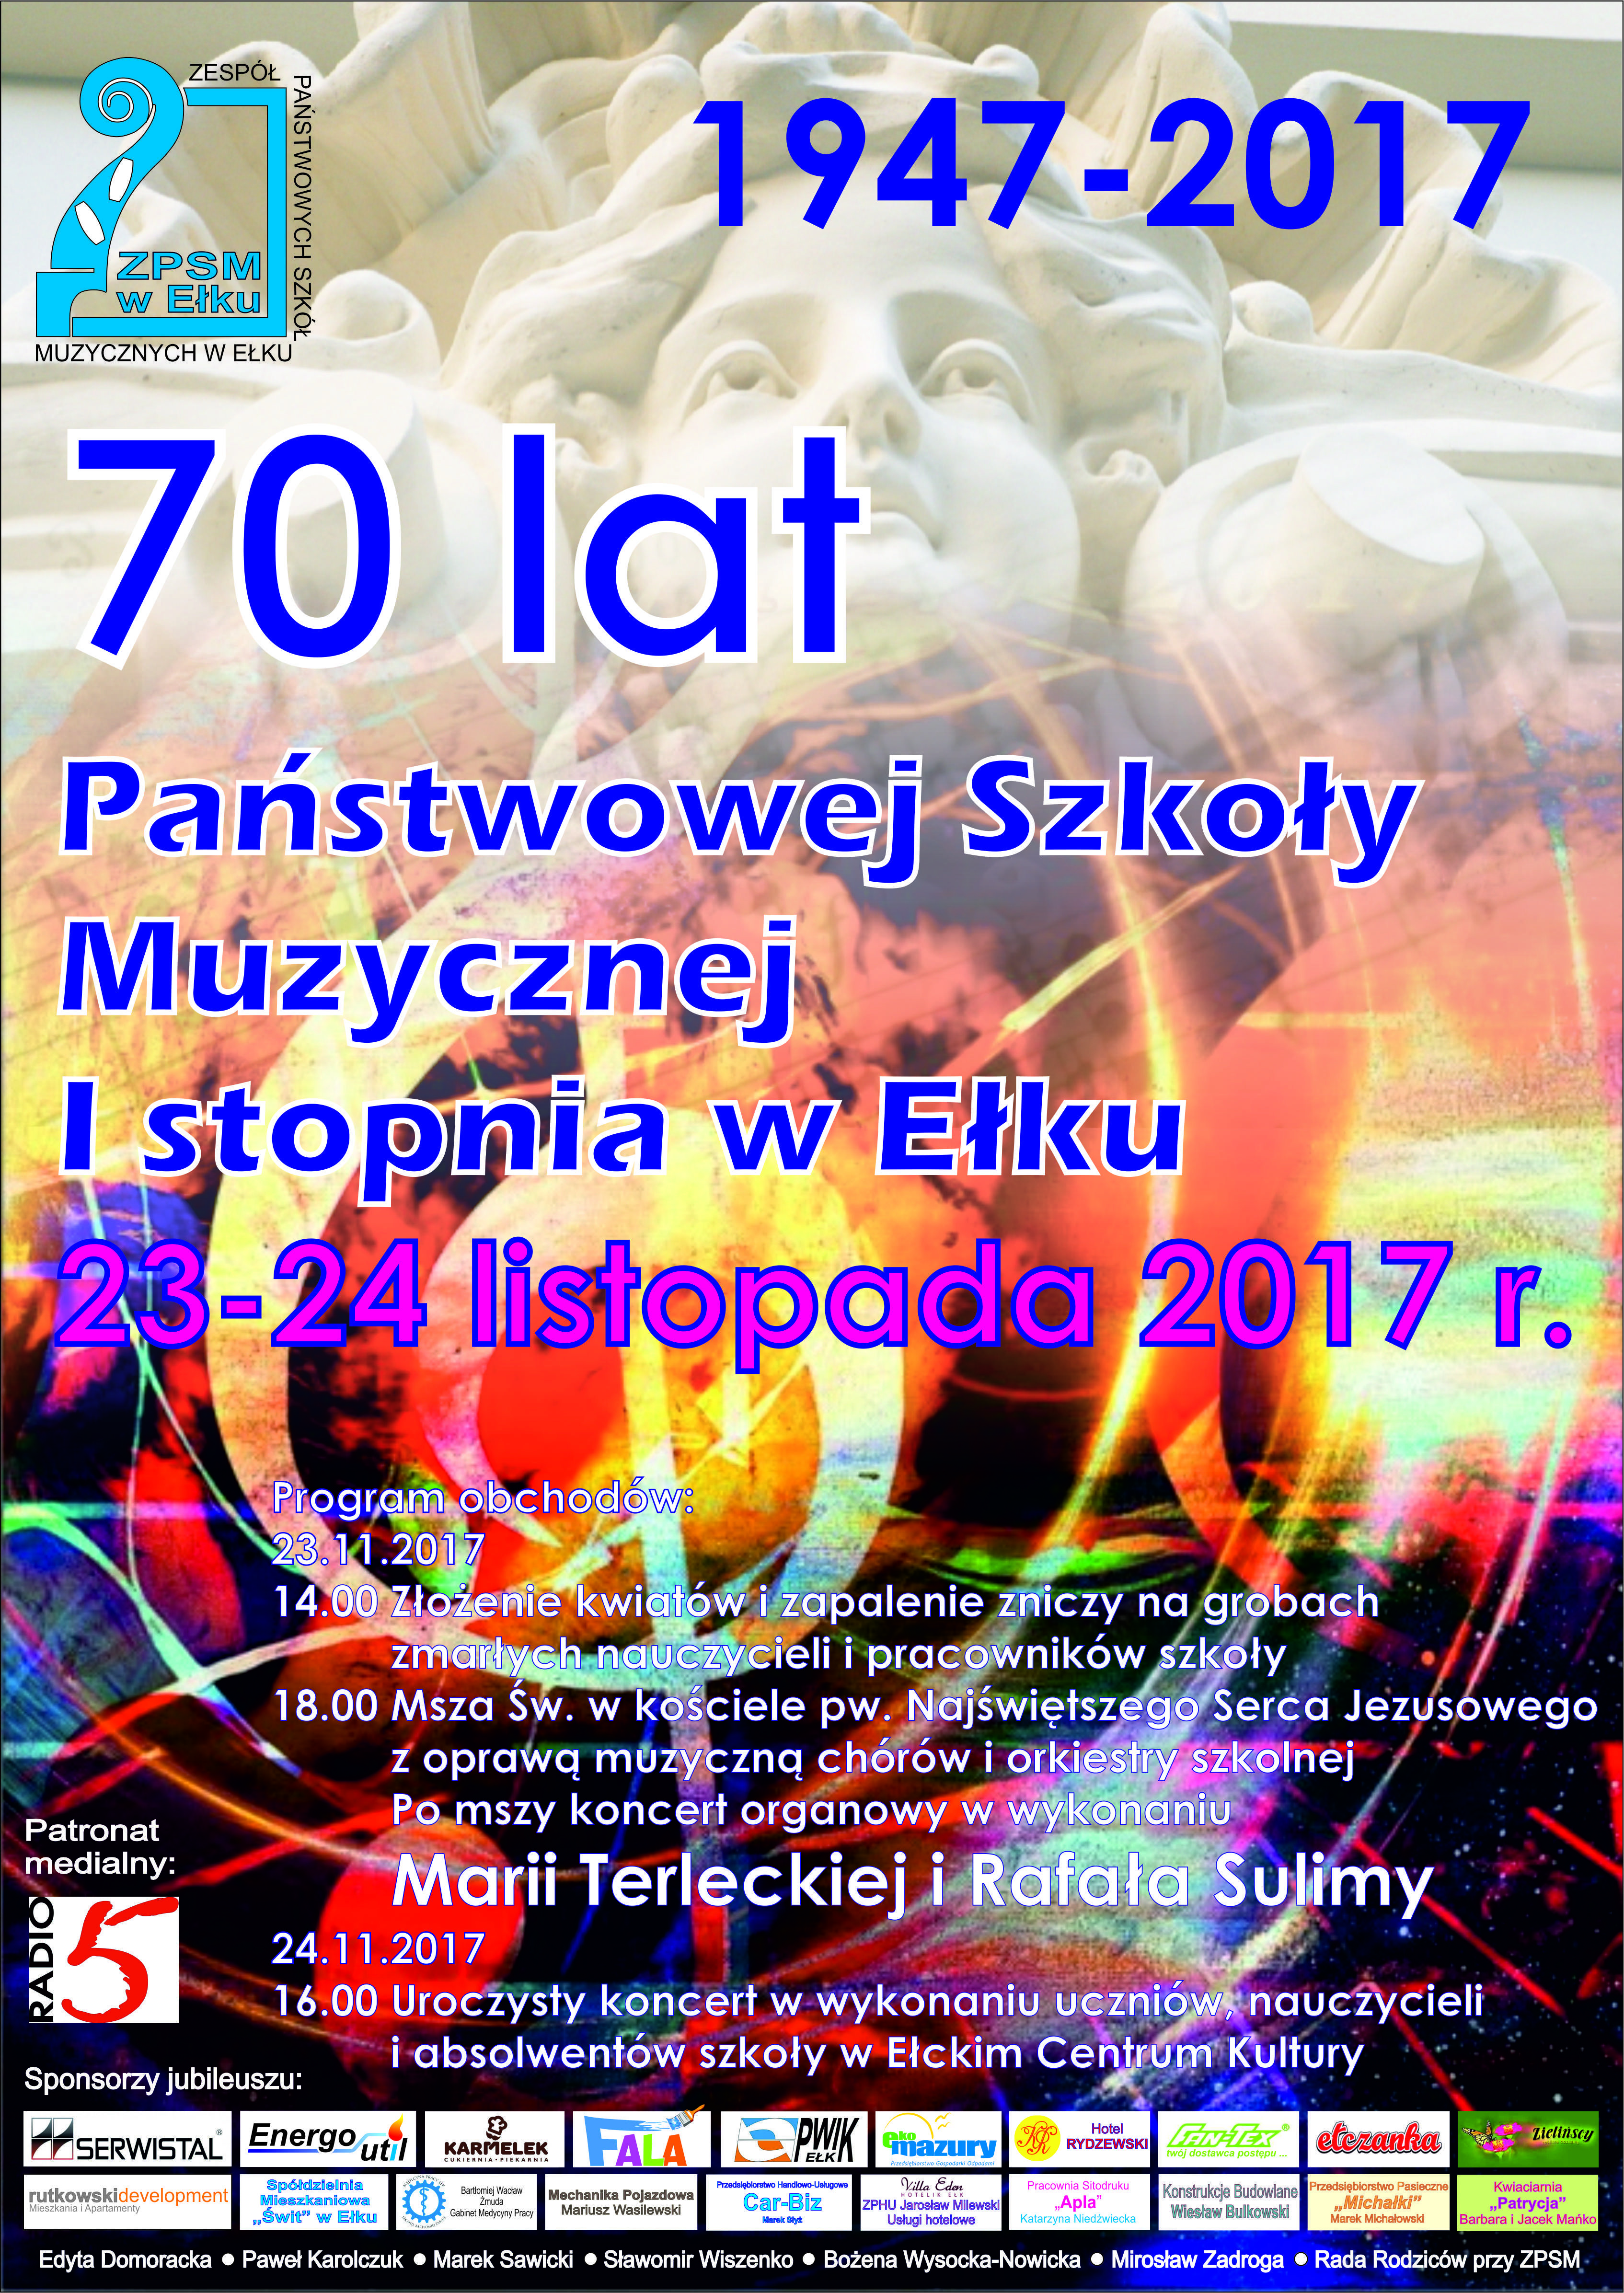 http://m.wm.pl/2017/11/orig/plakat-a3-70lat-psm-429680.jpg